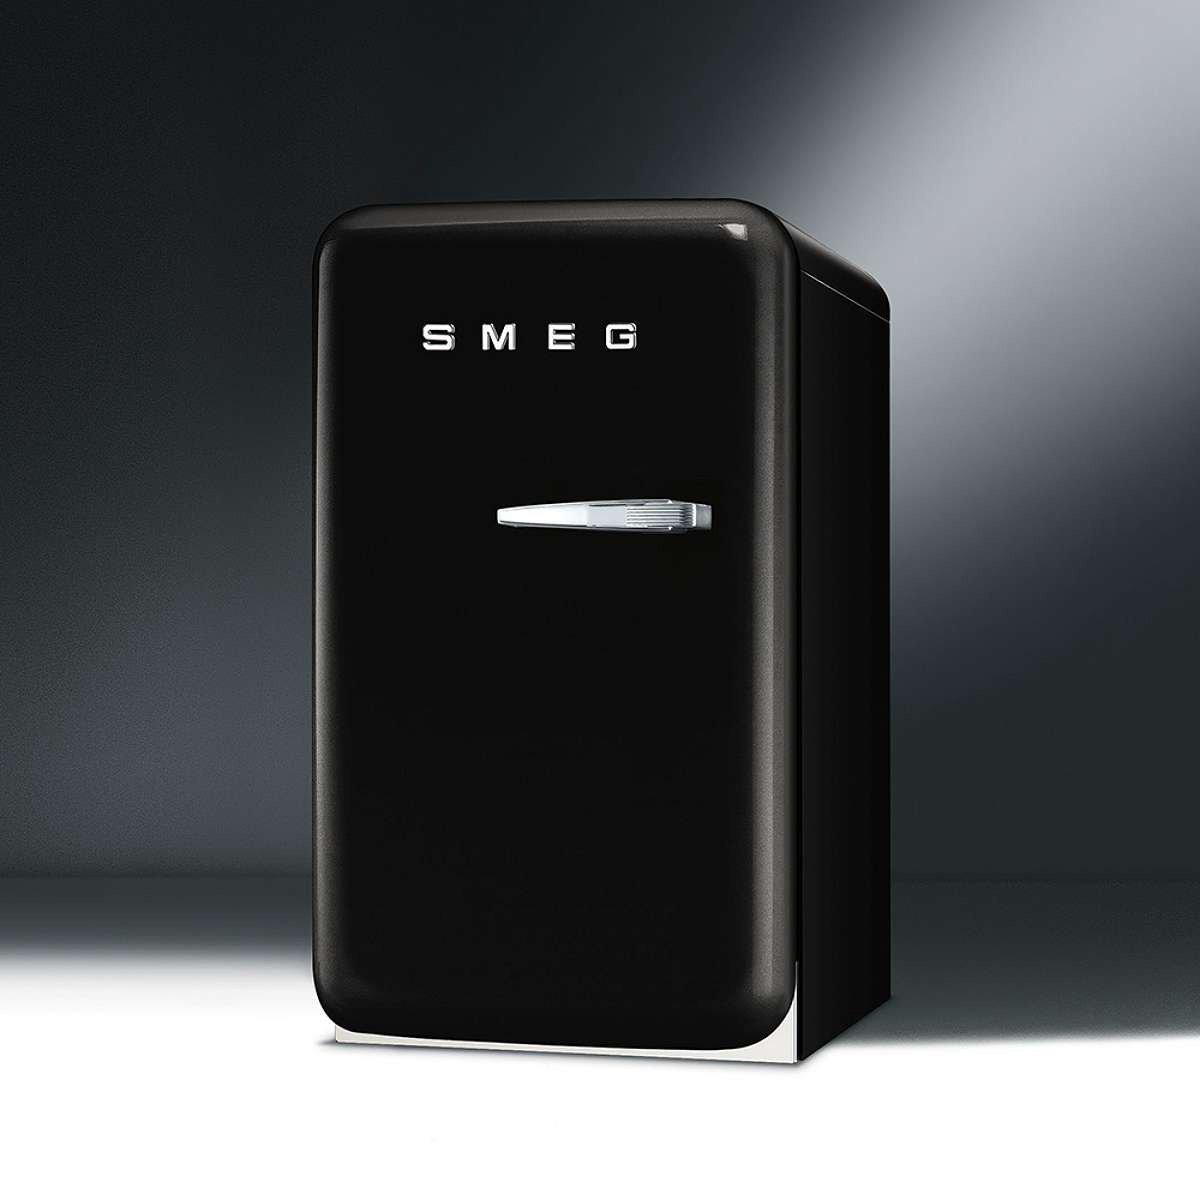 Smeg 50s Style Mini Refrigerator The Green Head